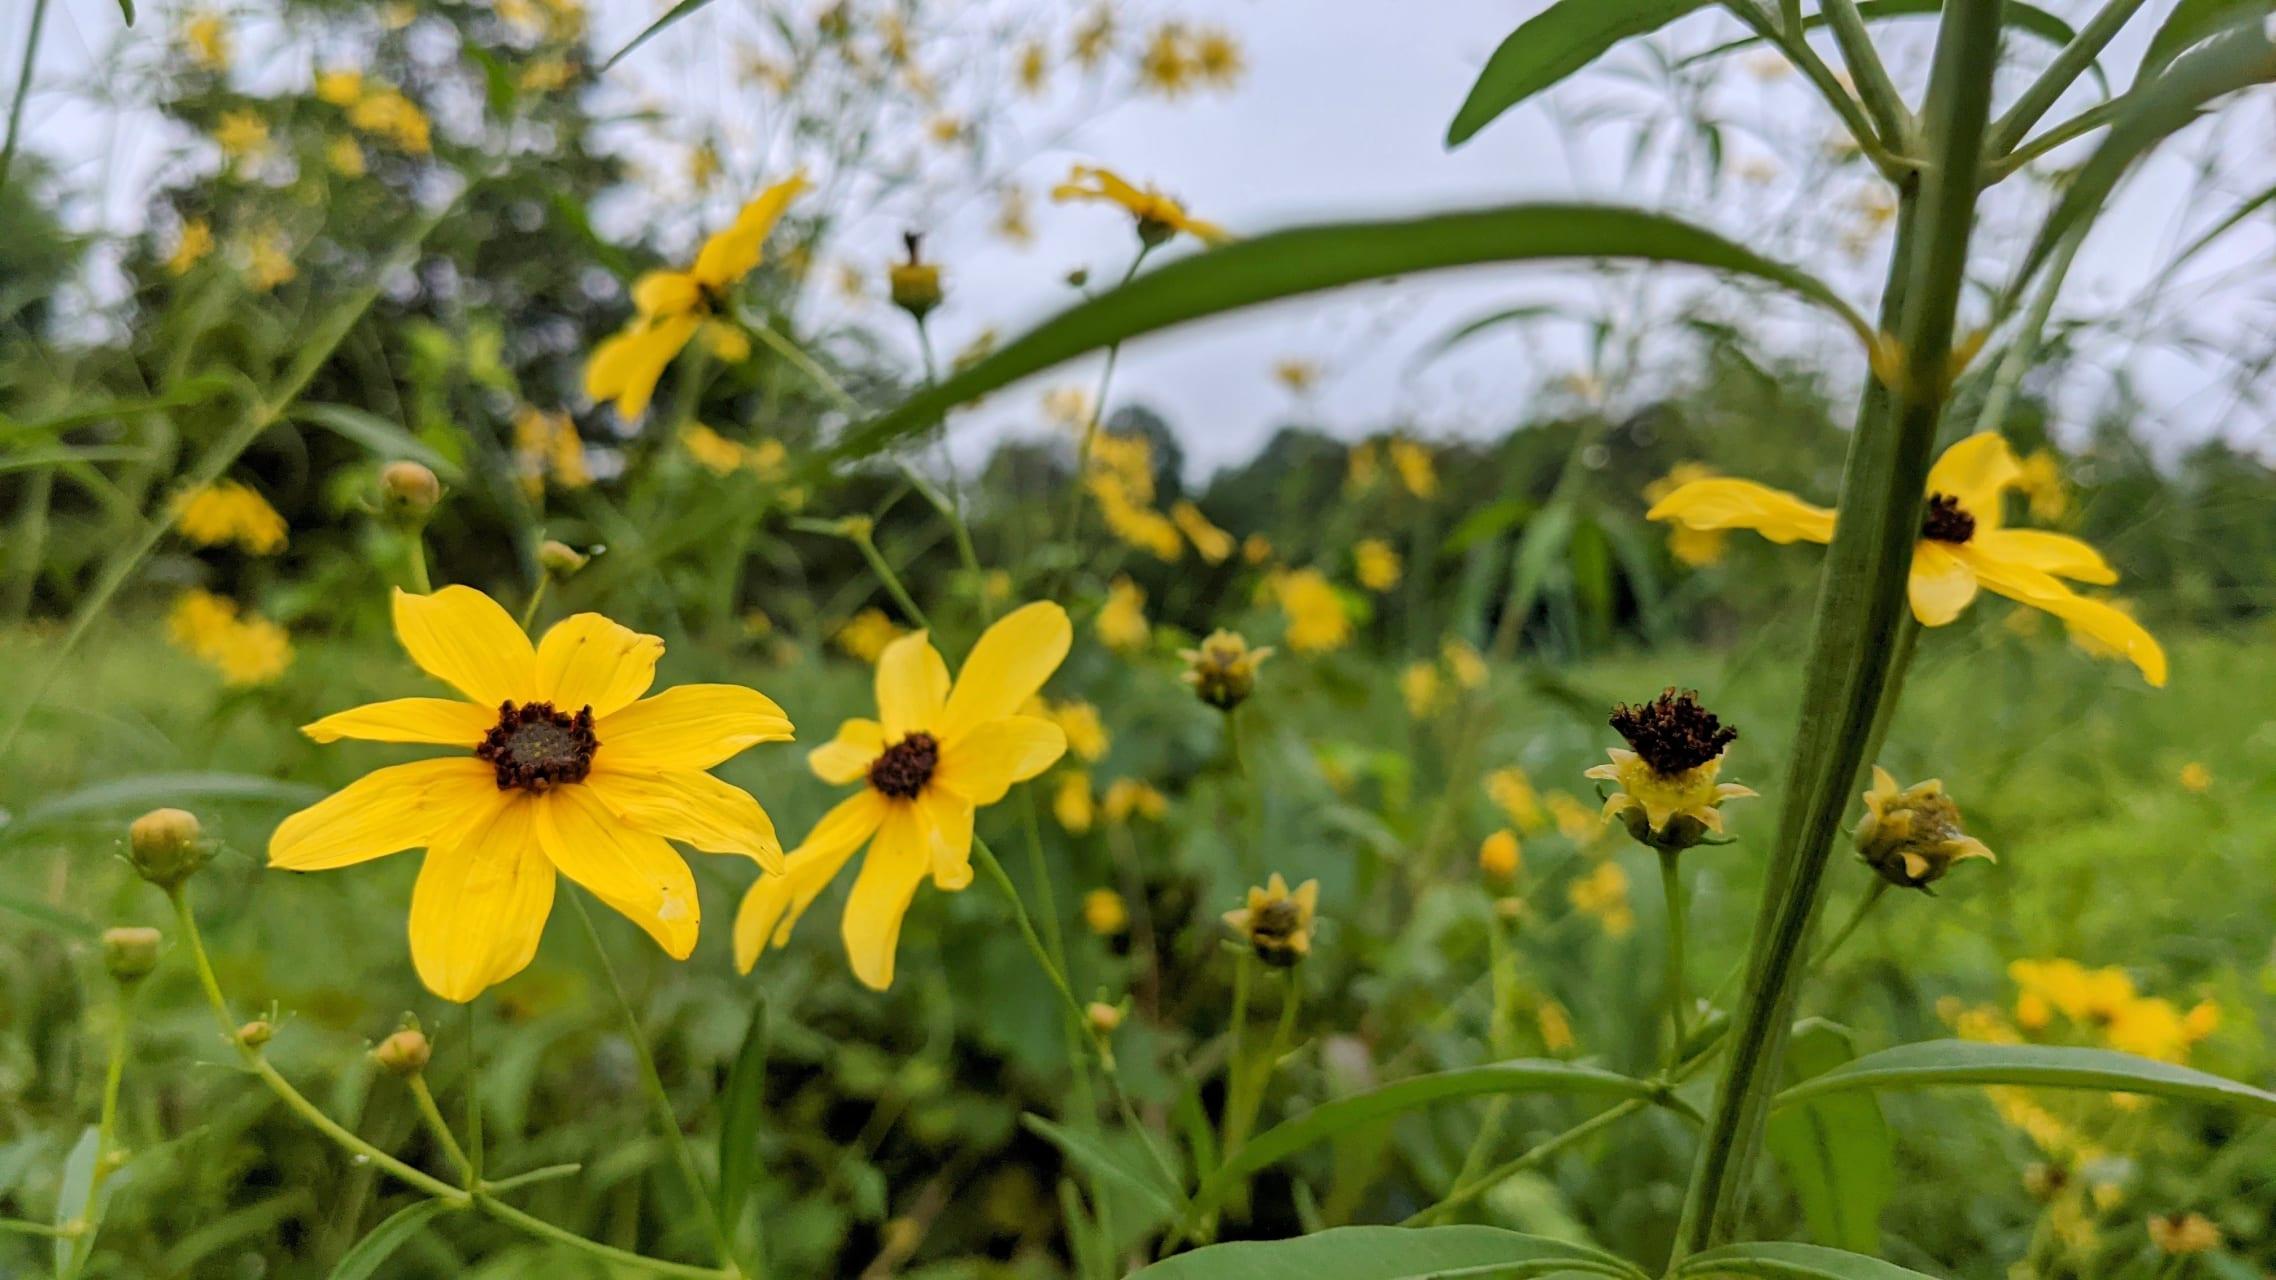 Pennsylvania - Meandering through the Meadow